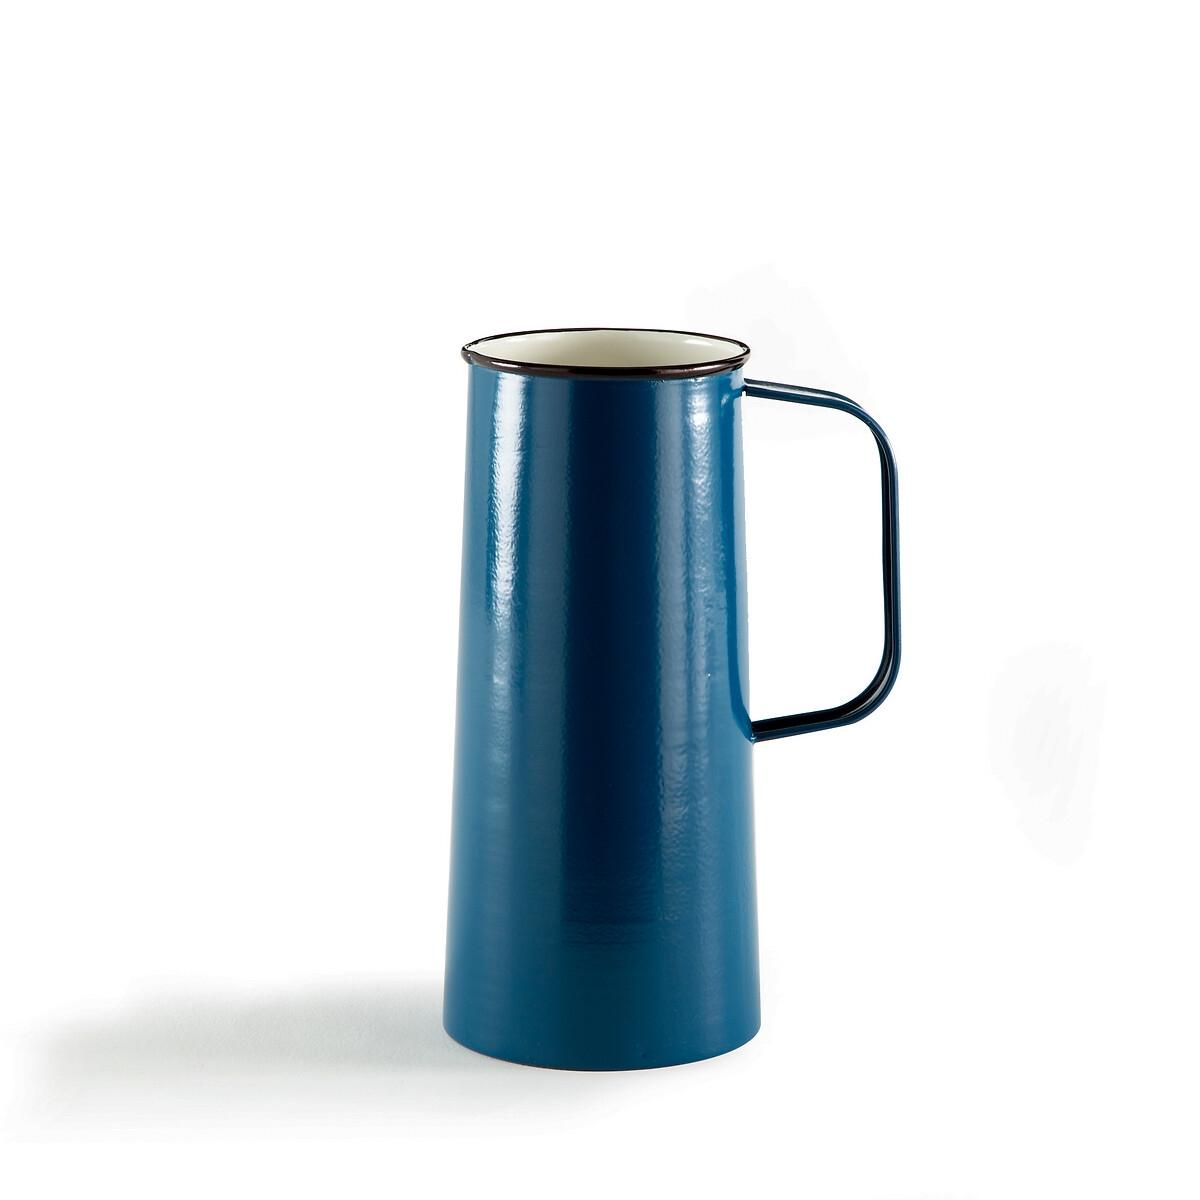 Графин LaRedoute Из металла Octave единый размер синий